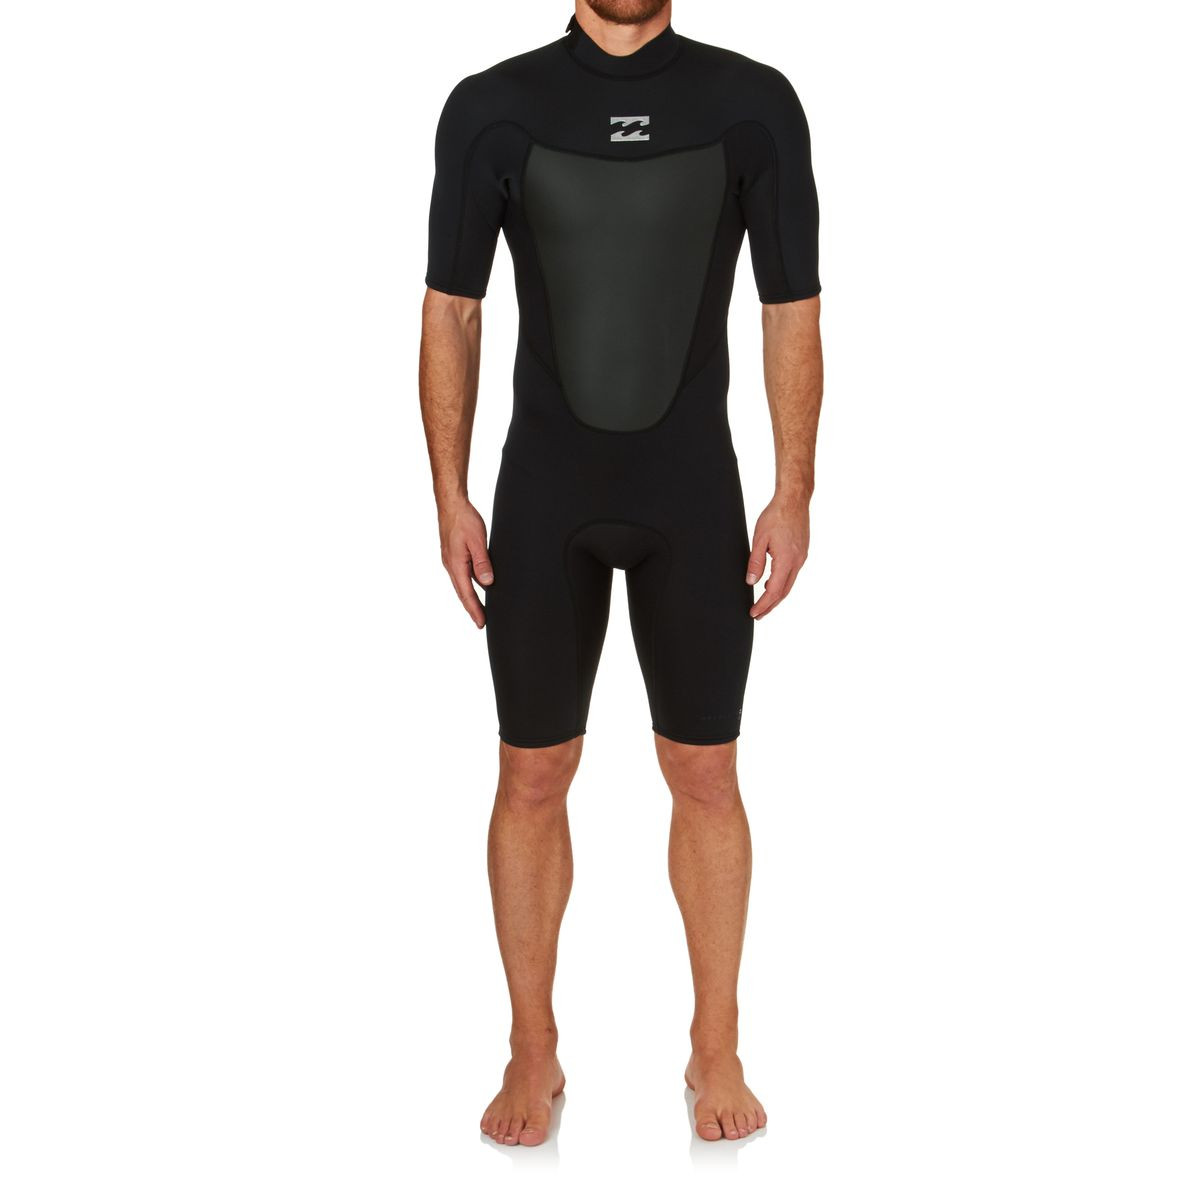 Billabong Absolute Comp 2mm 2017 Back Zip Short Sleeve Shorty Wetsuit - Black